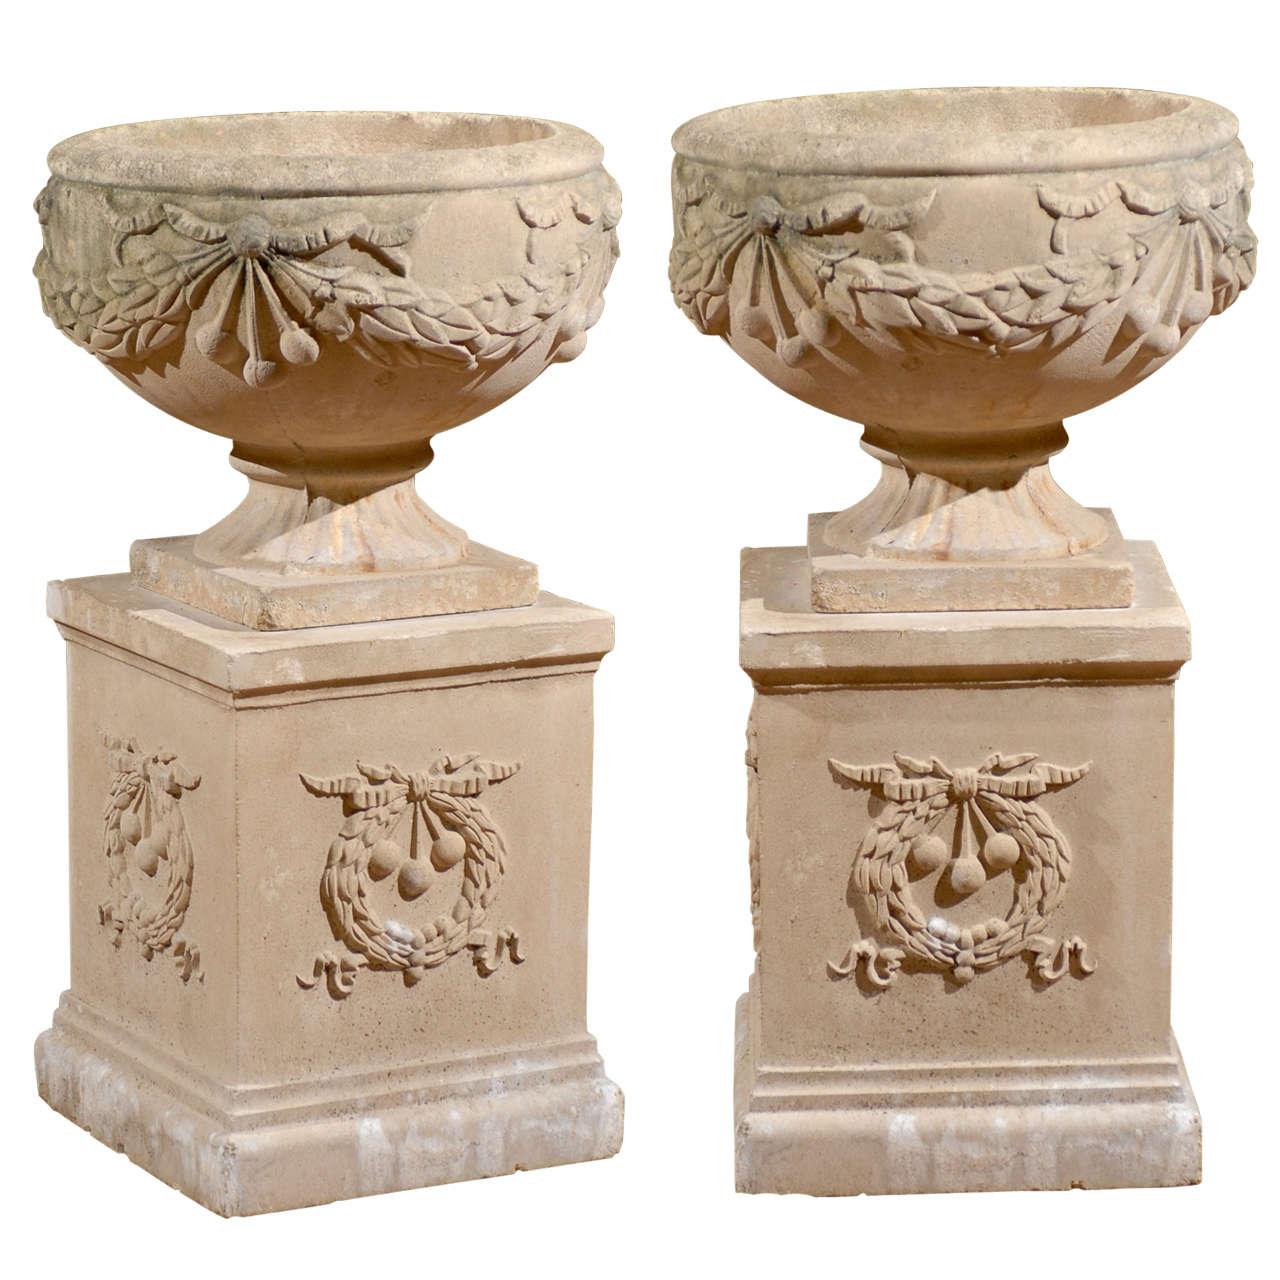 Pair Of Vintage Urns On Pedestals At 1stdibs